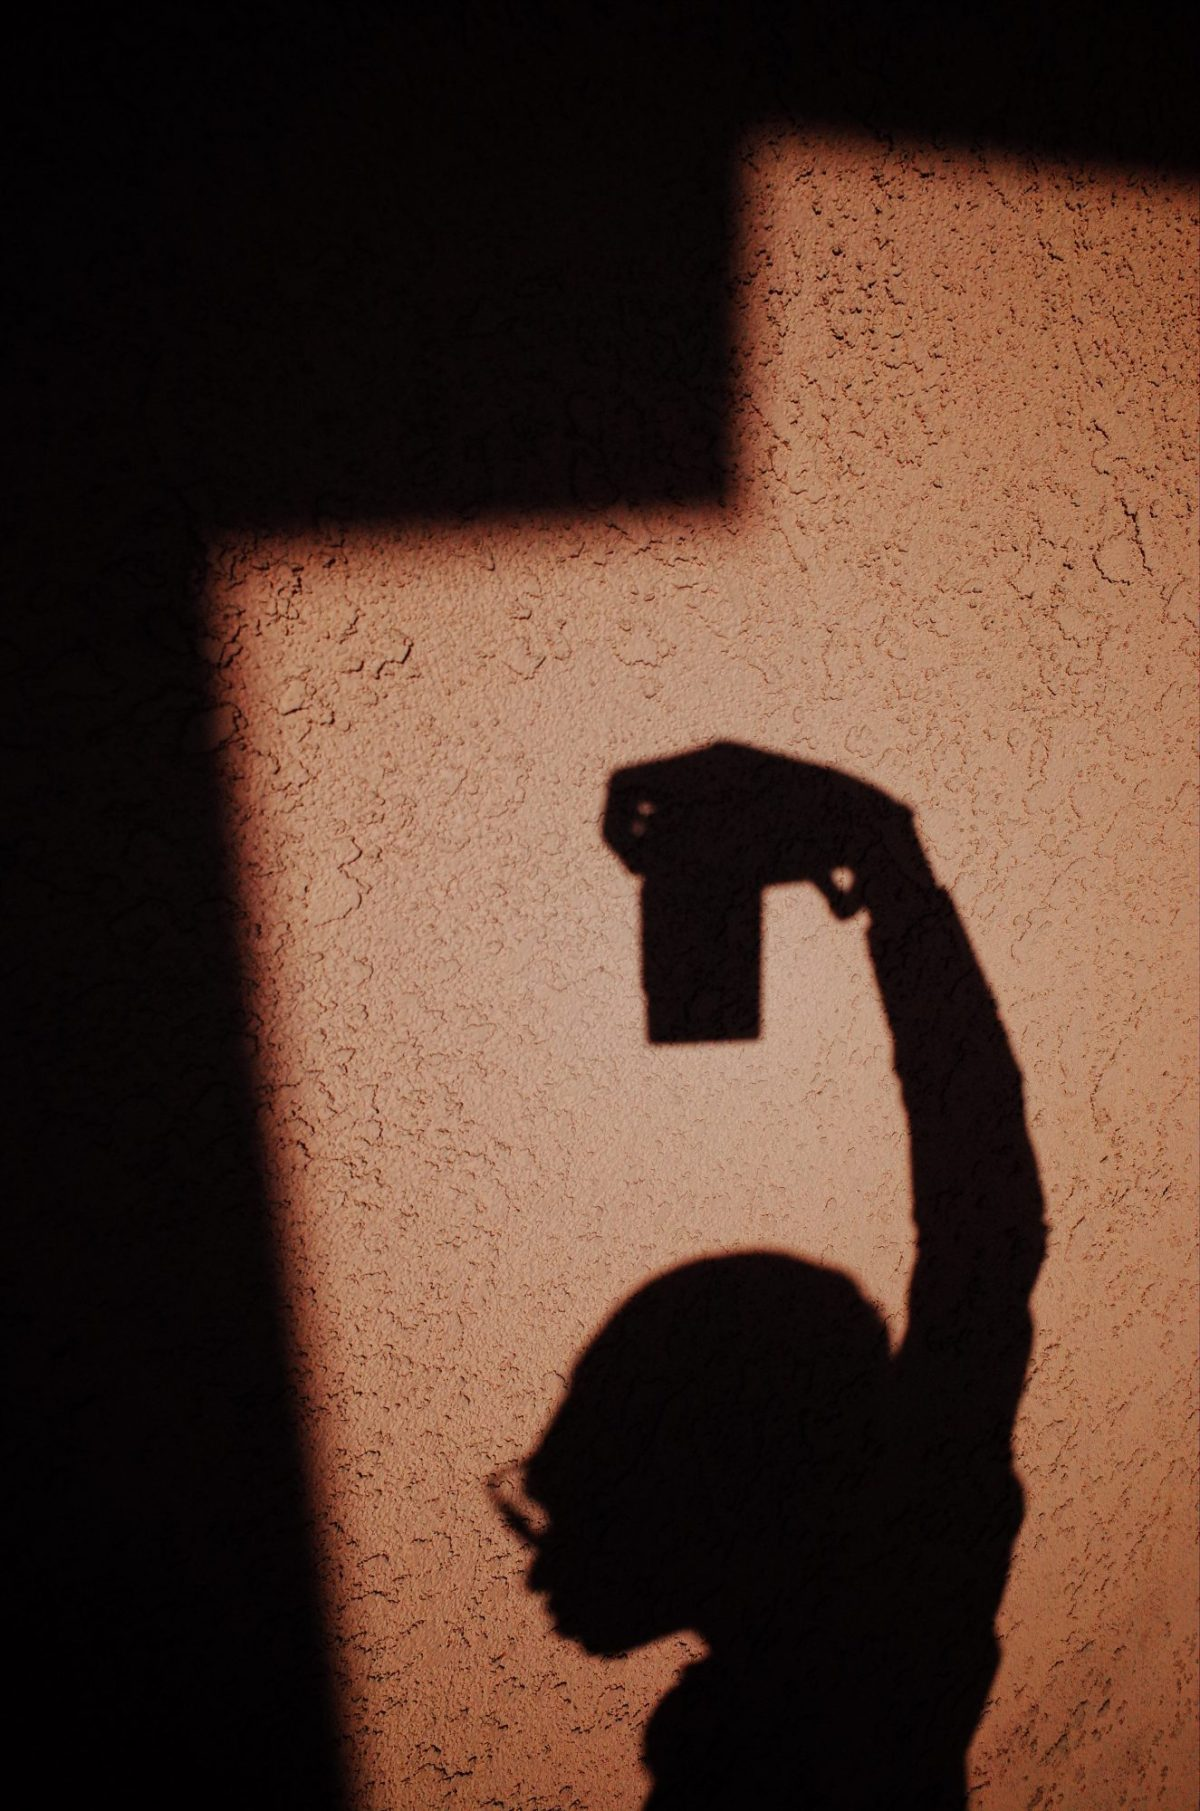 Eric Kim selfie